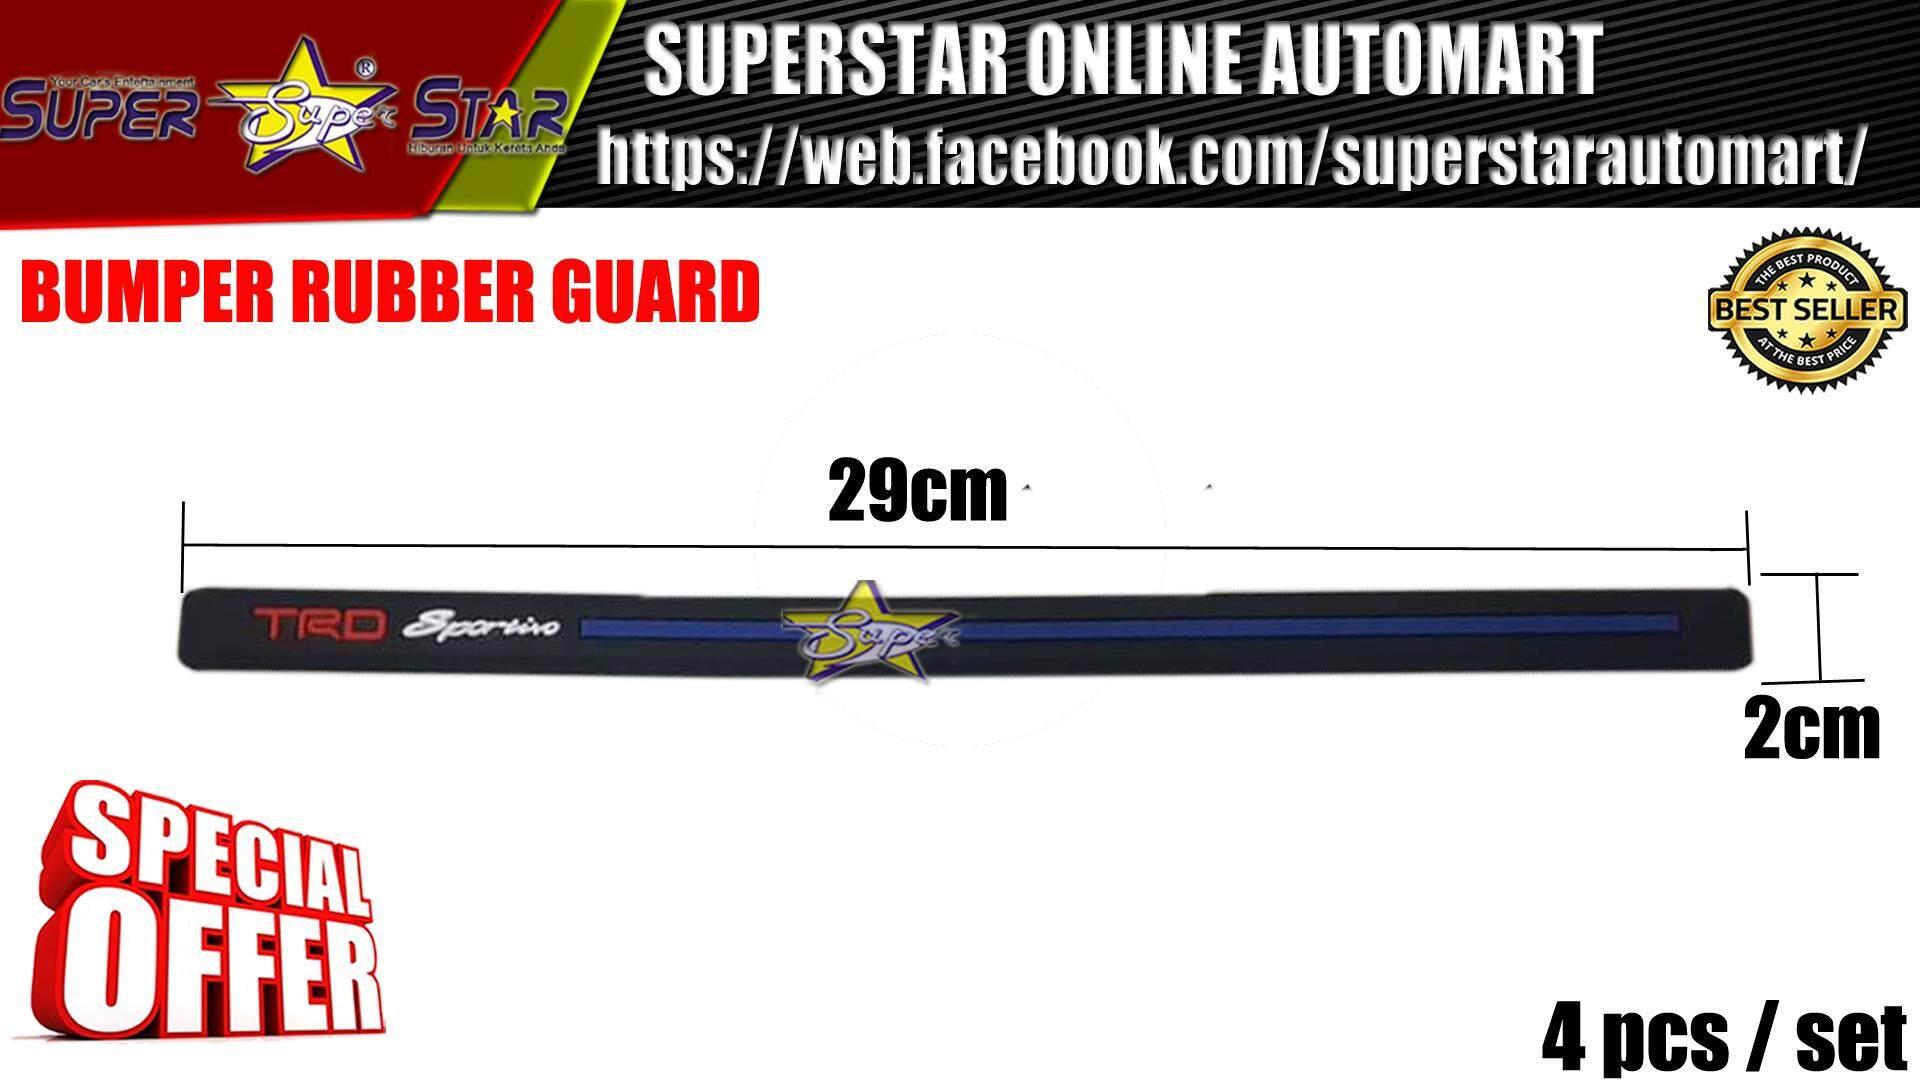 BUMPER RUBBER GUARD TRD (BLUE LINE)